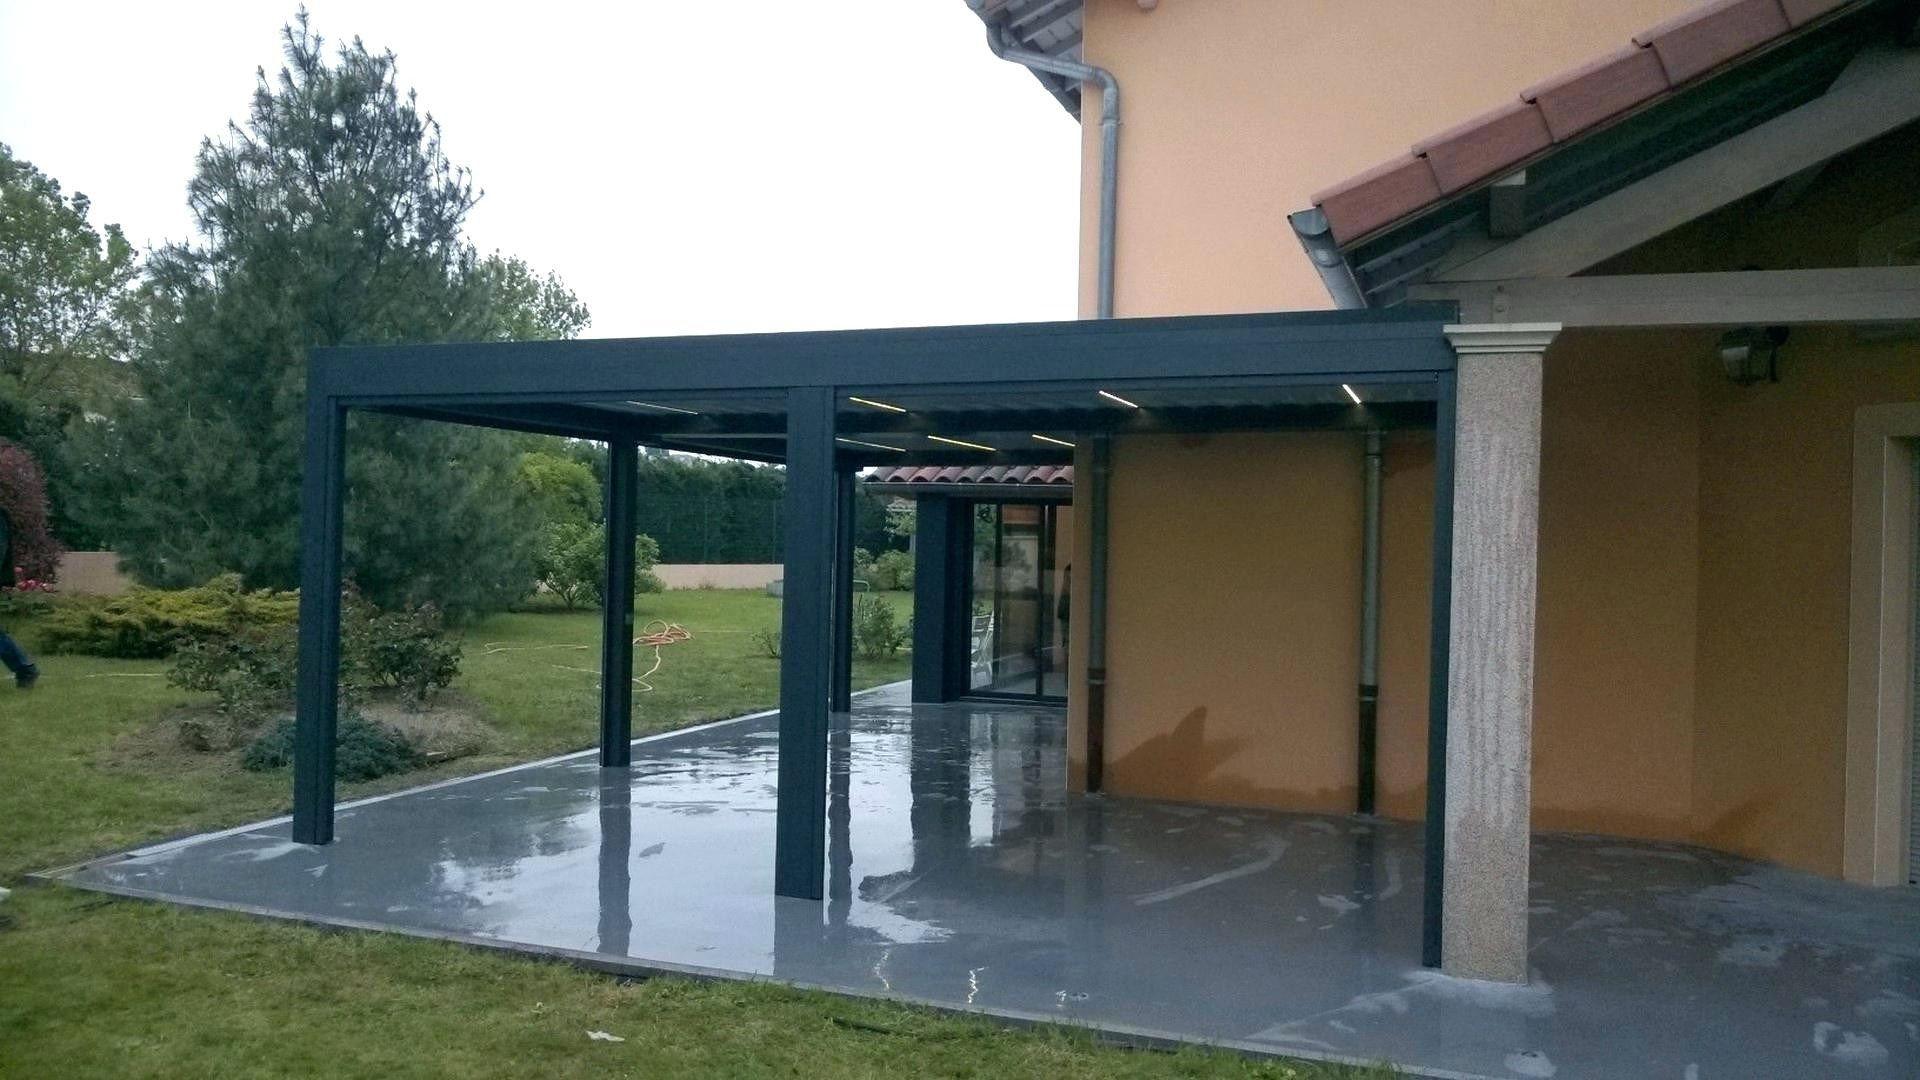 Lovely Montage Pergola Alu Brico Depot Pergola Alu Pergola Idees Pour La Maison